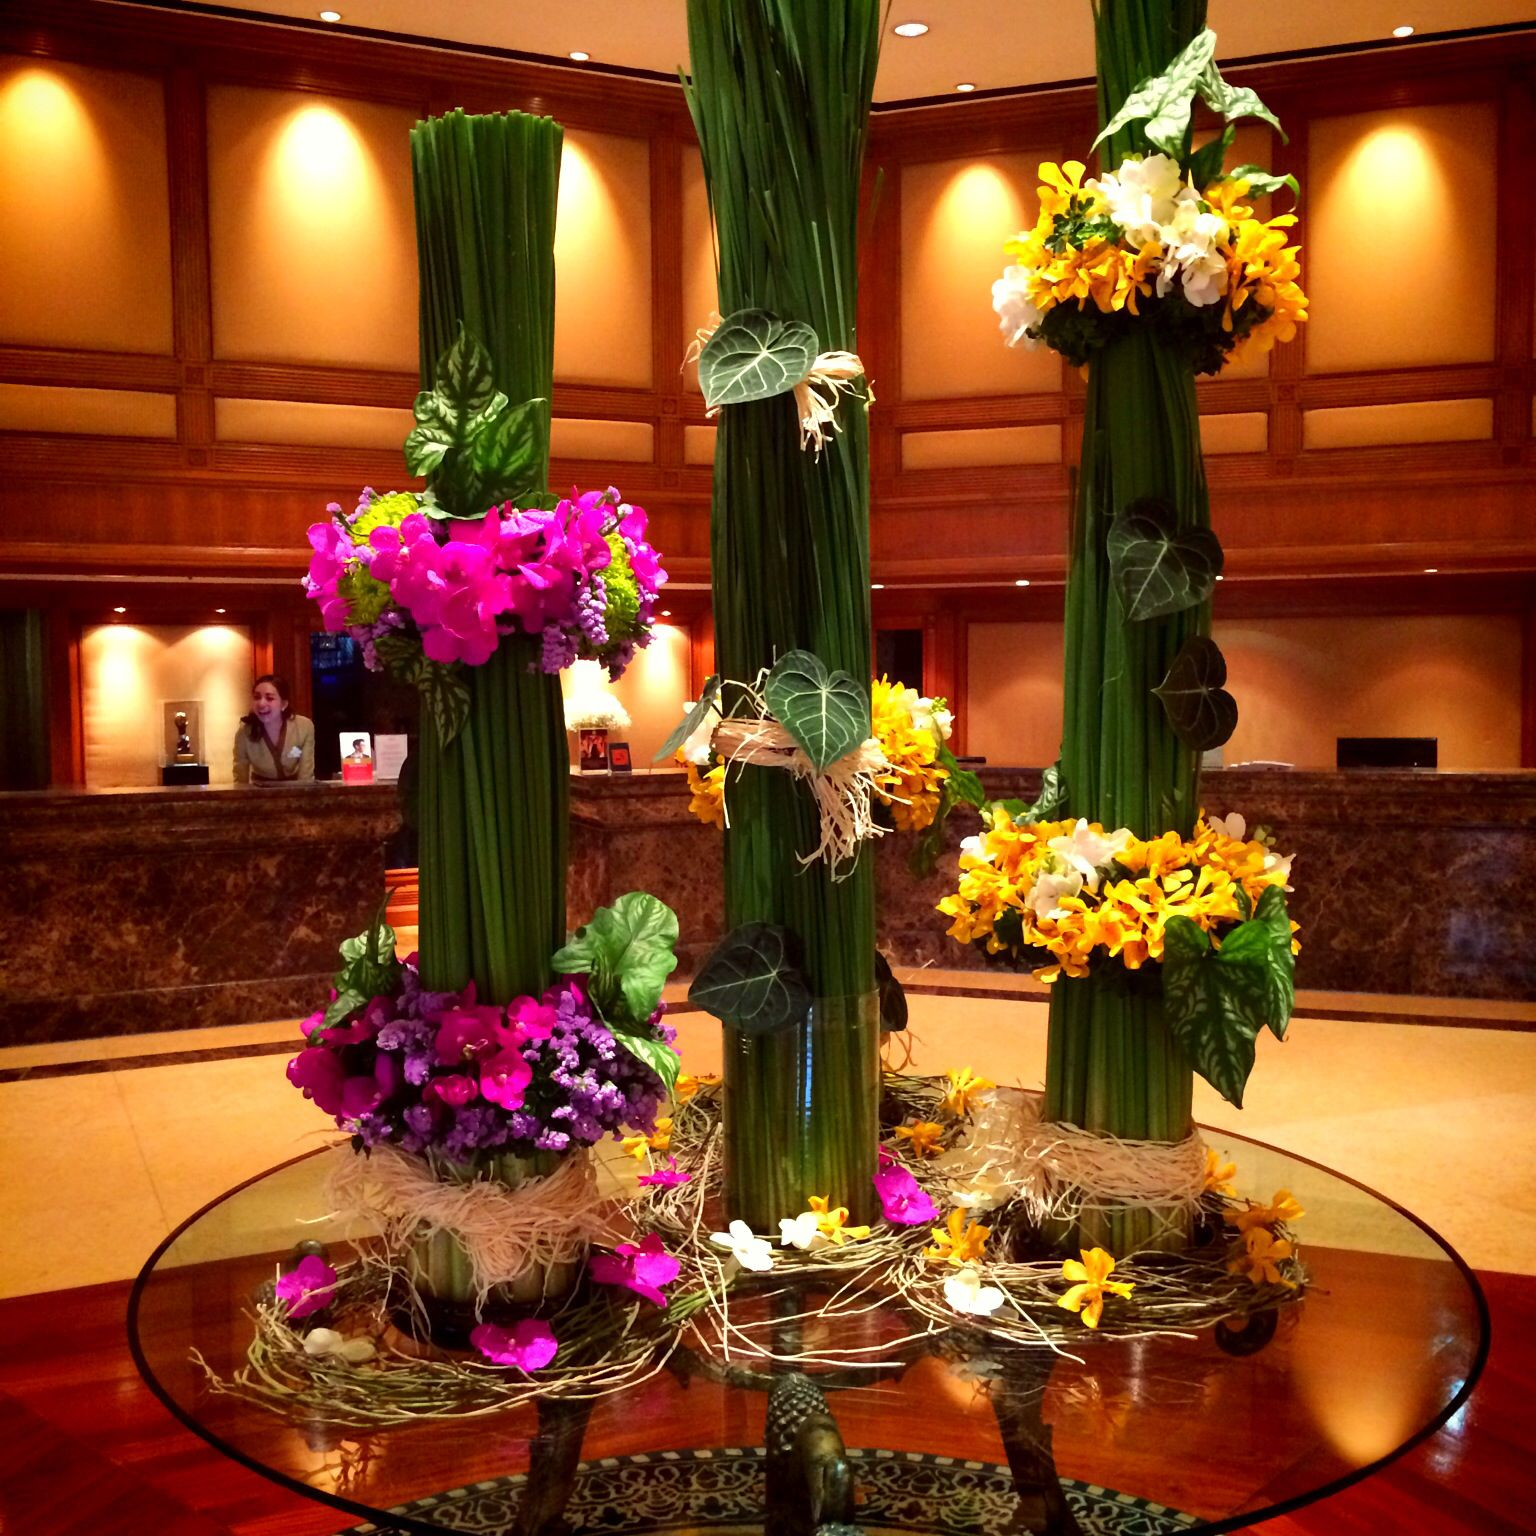 Hotel lobby Fresh flowers arrangements, Large flower